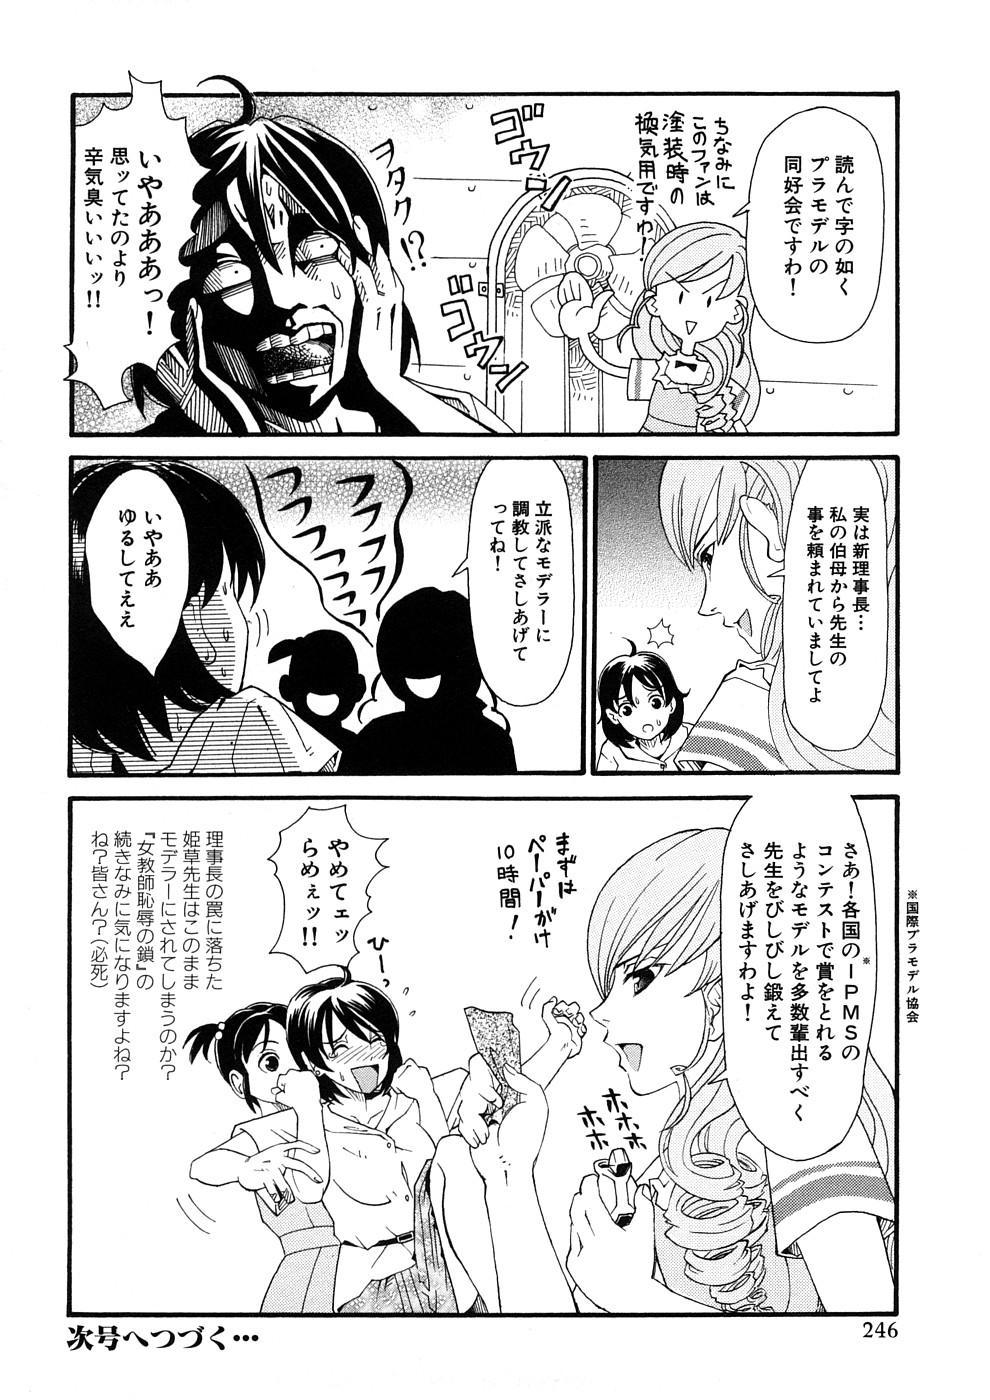 Geki Yaba Anthology Vol. 1 - Naka ni Dashite yo 246